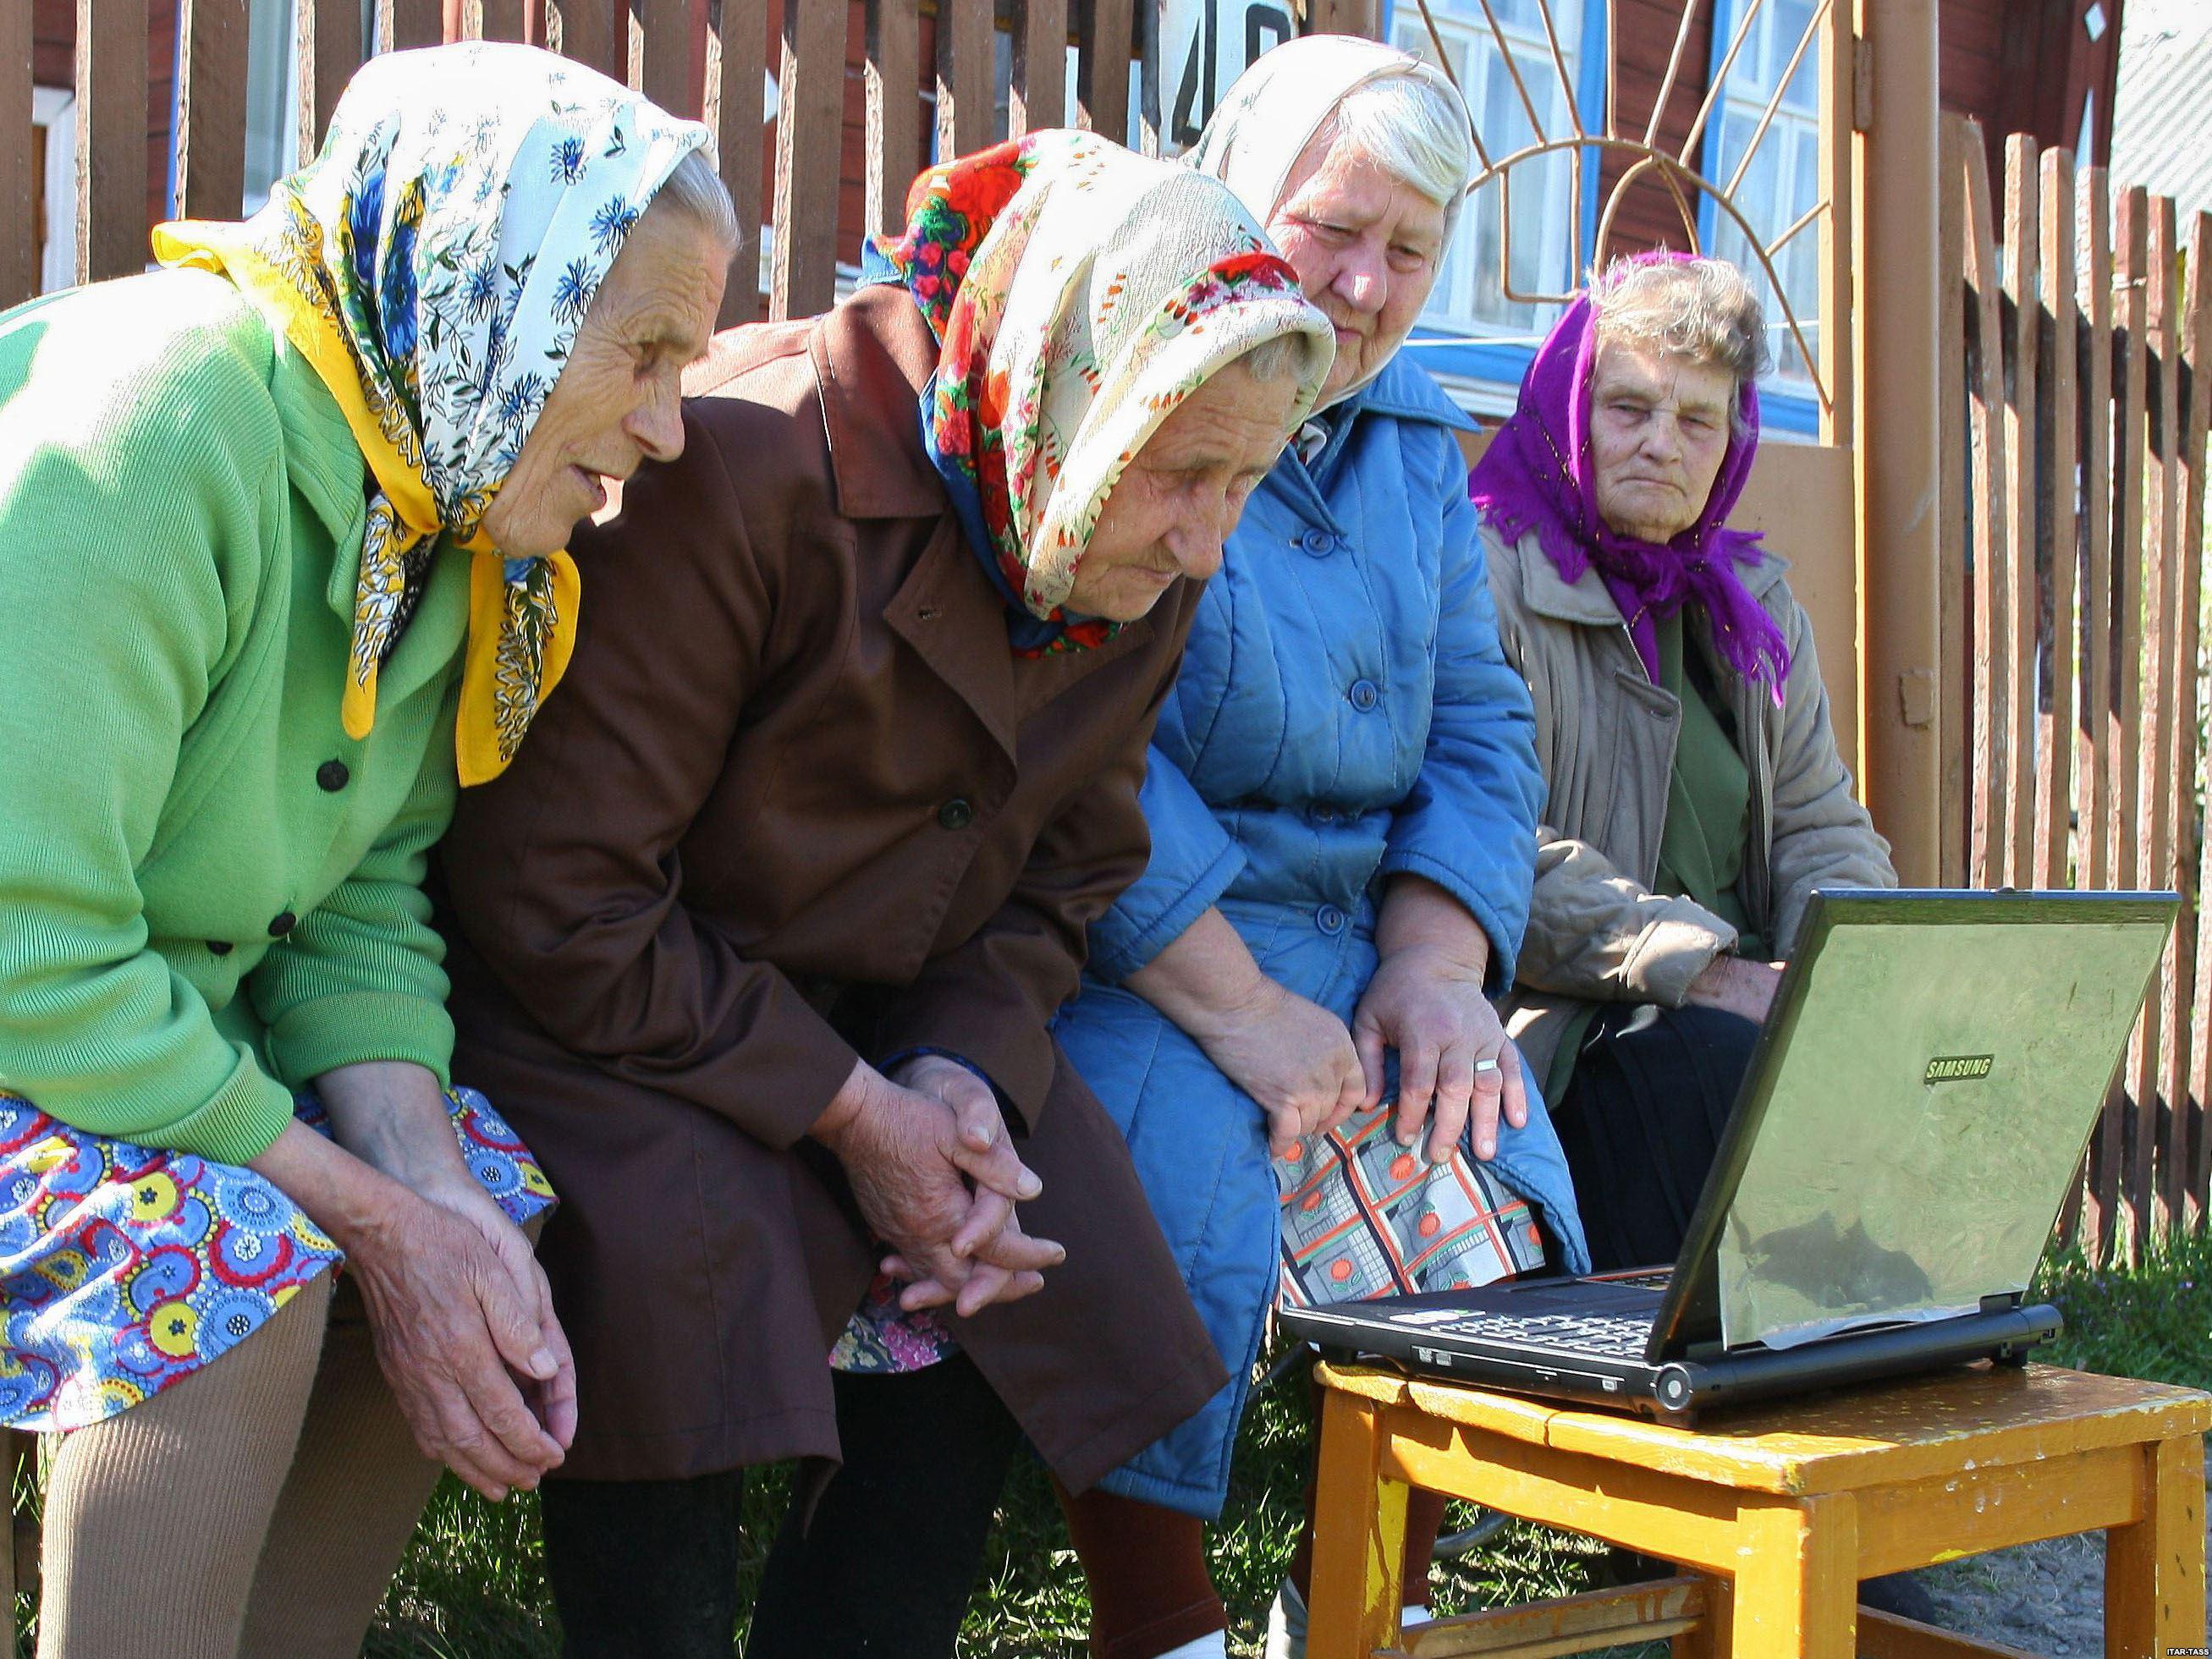 Картинка по теме: Нам года не беда коль душа молода. 90-летняя бабушка освоила Instagram